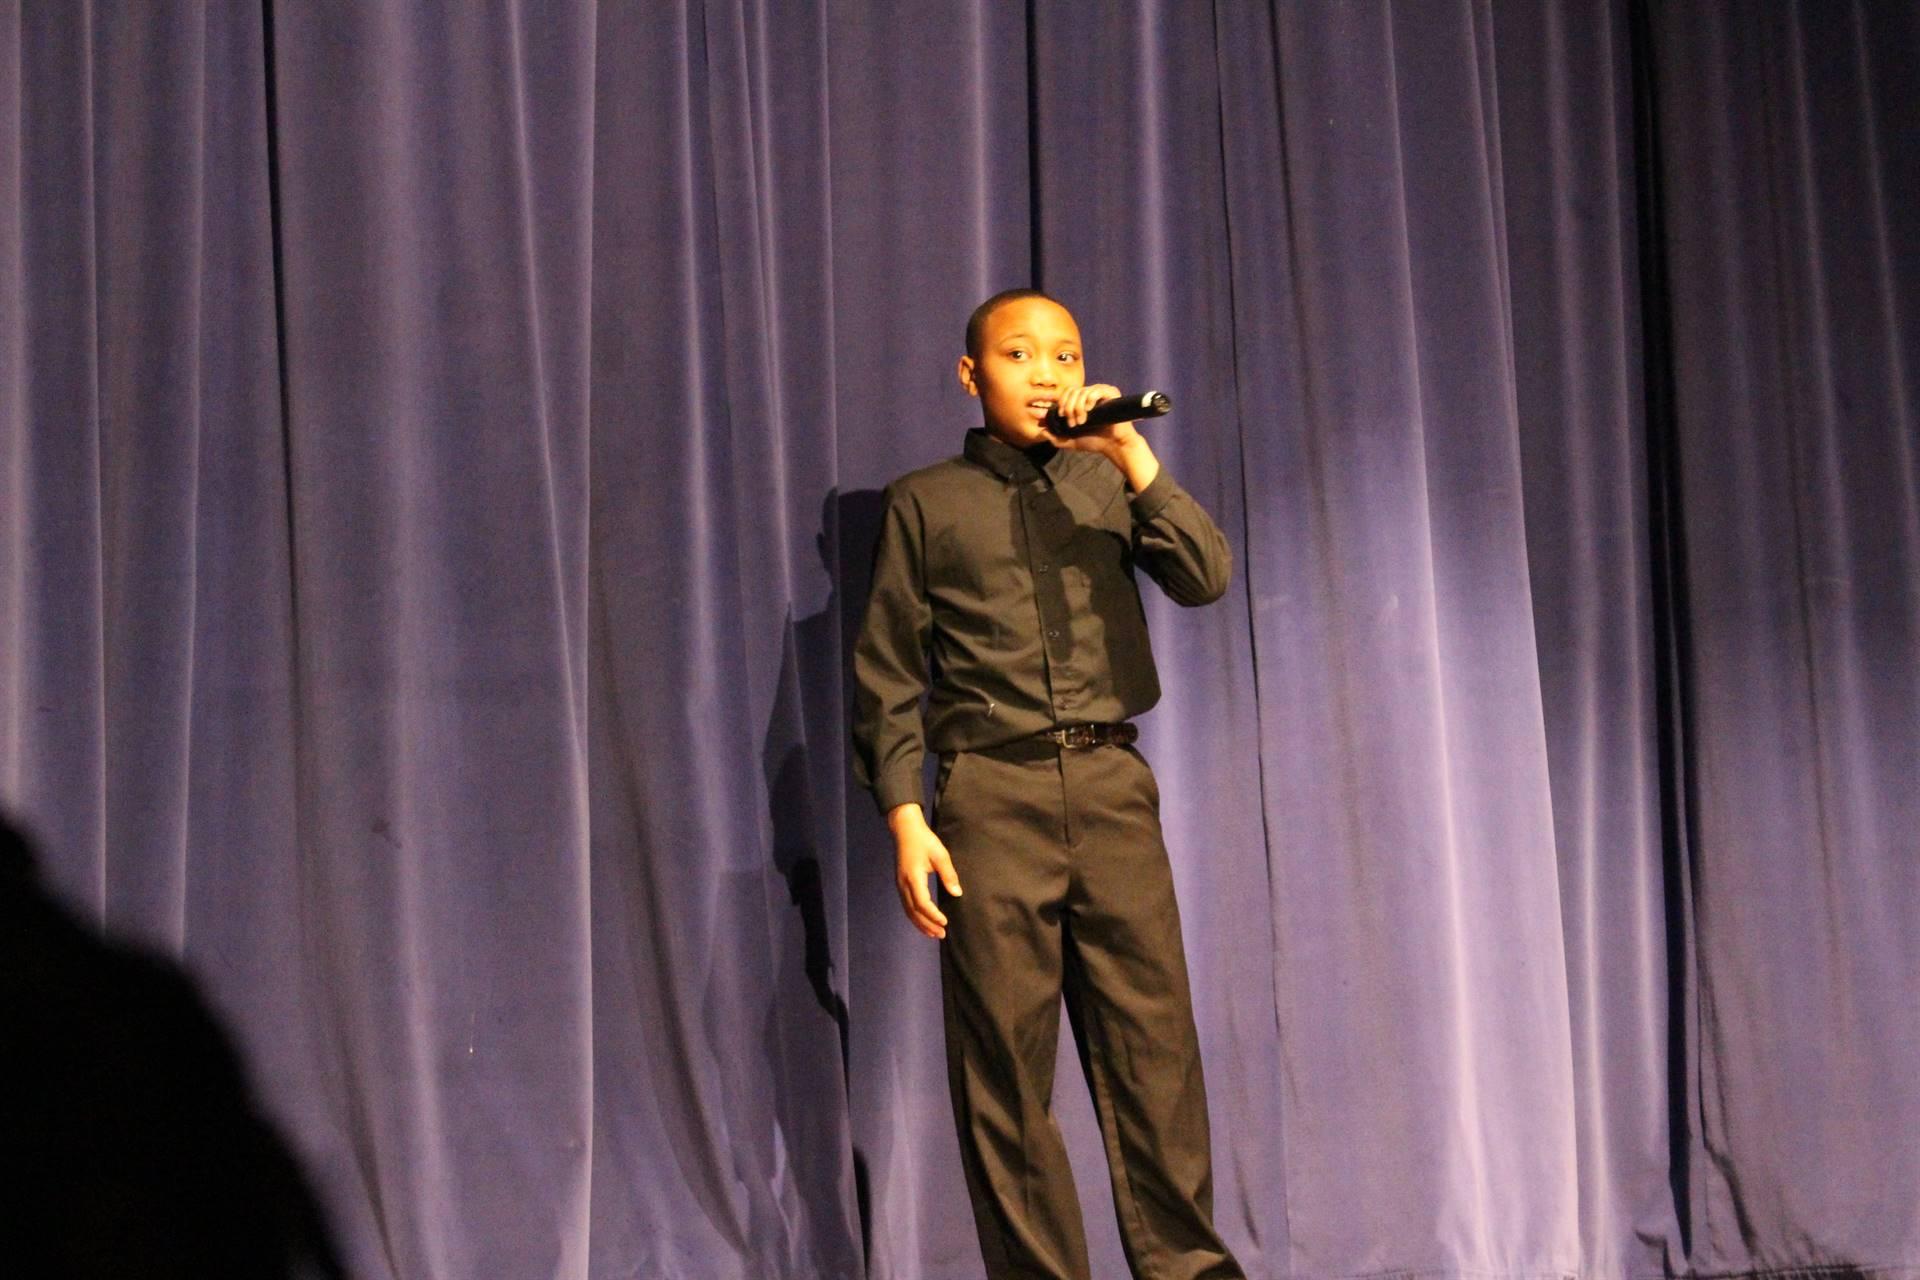 2018 District Wide Talent Show